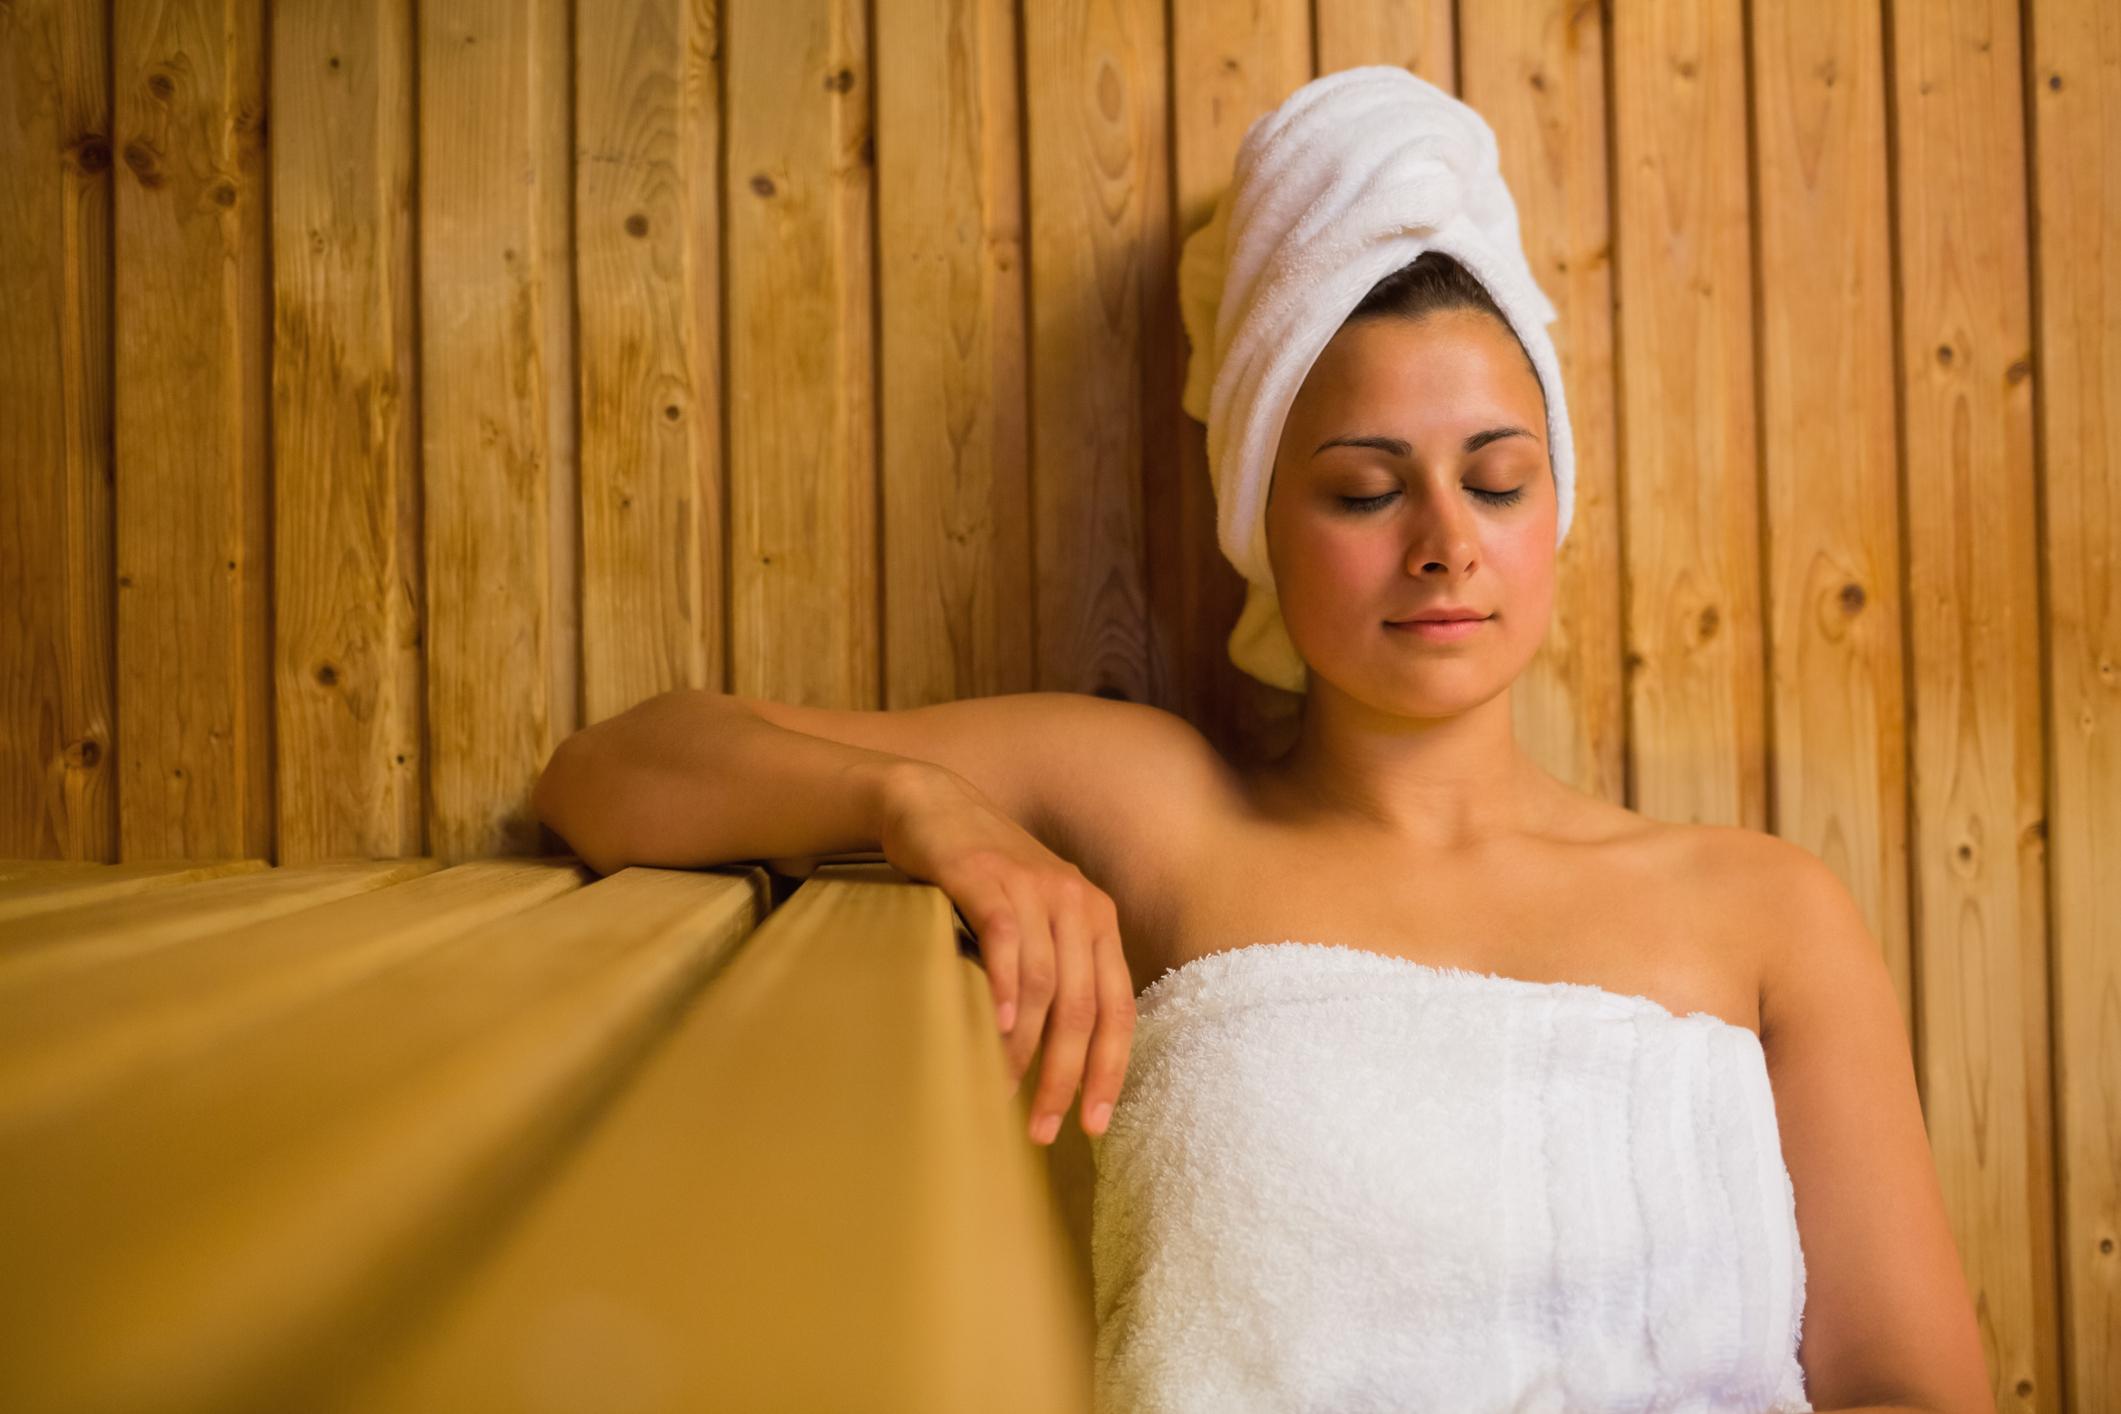 The Sauna Session, a Healthful Mini-Vacay - Fitness